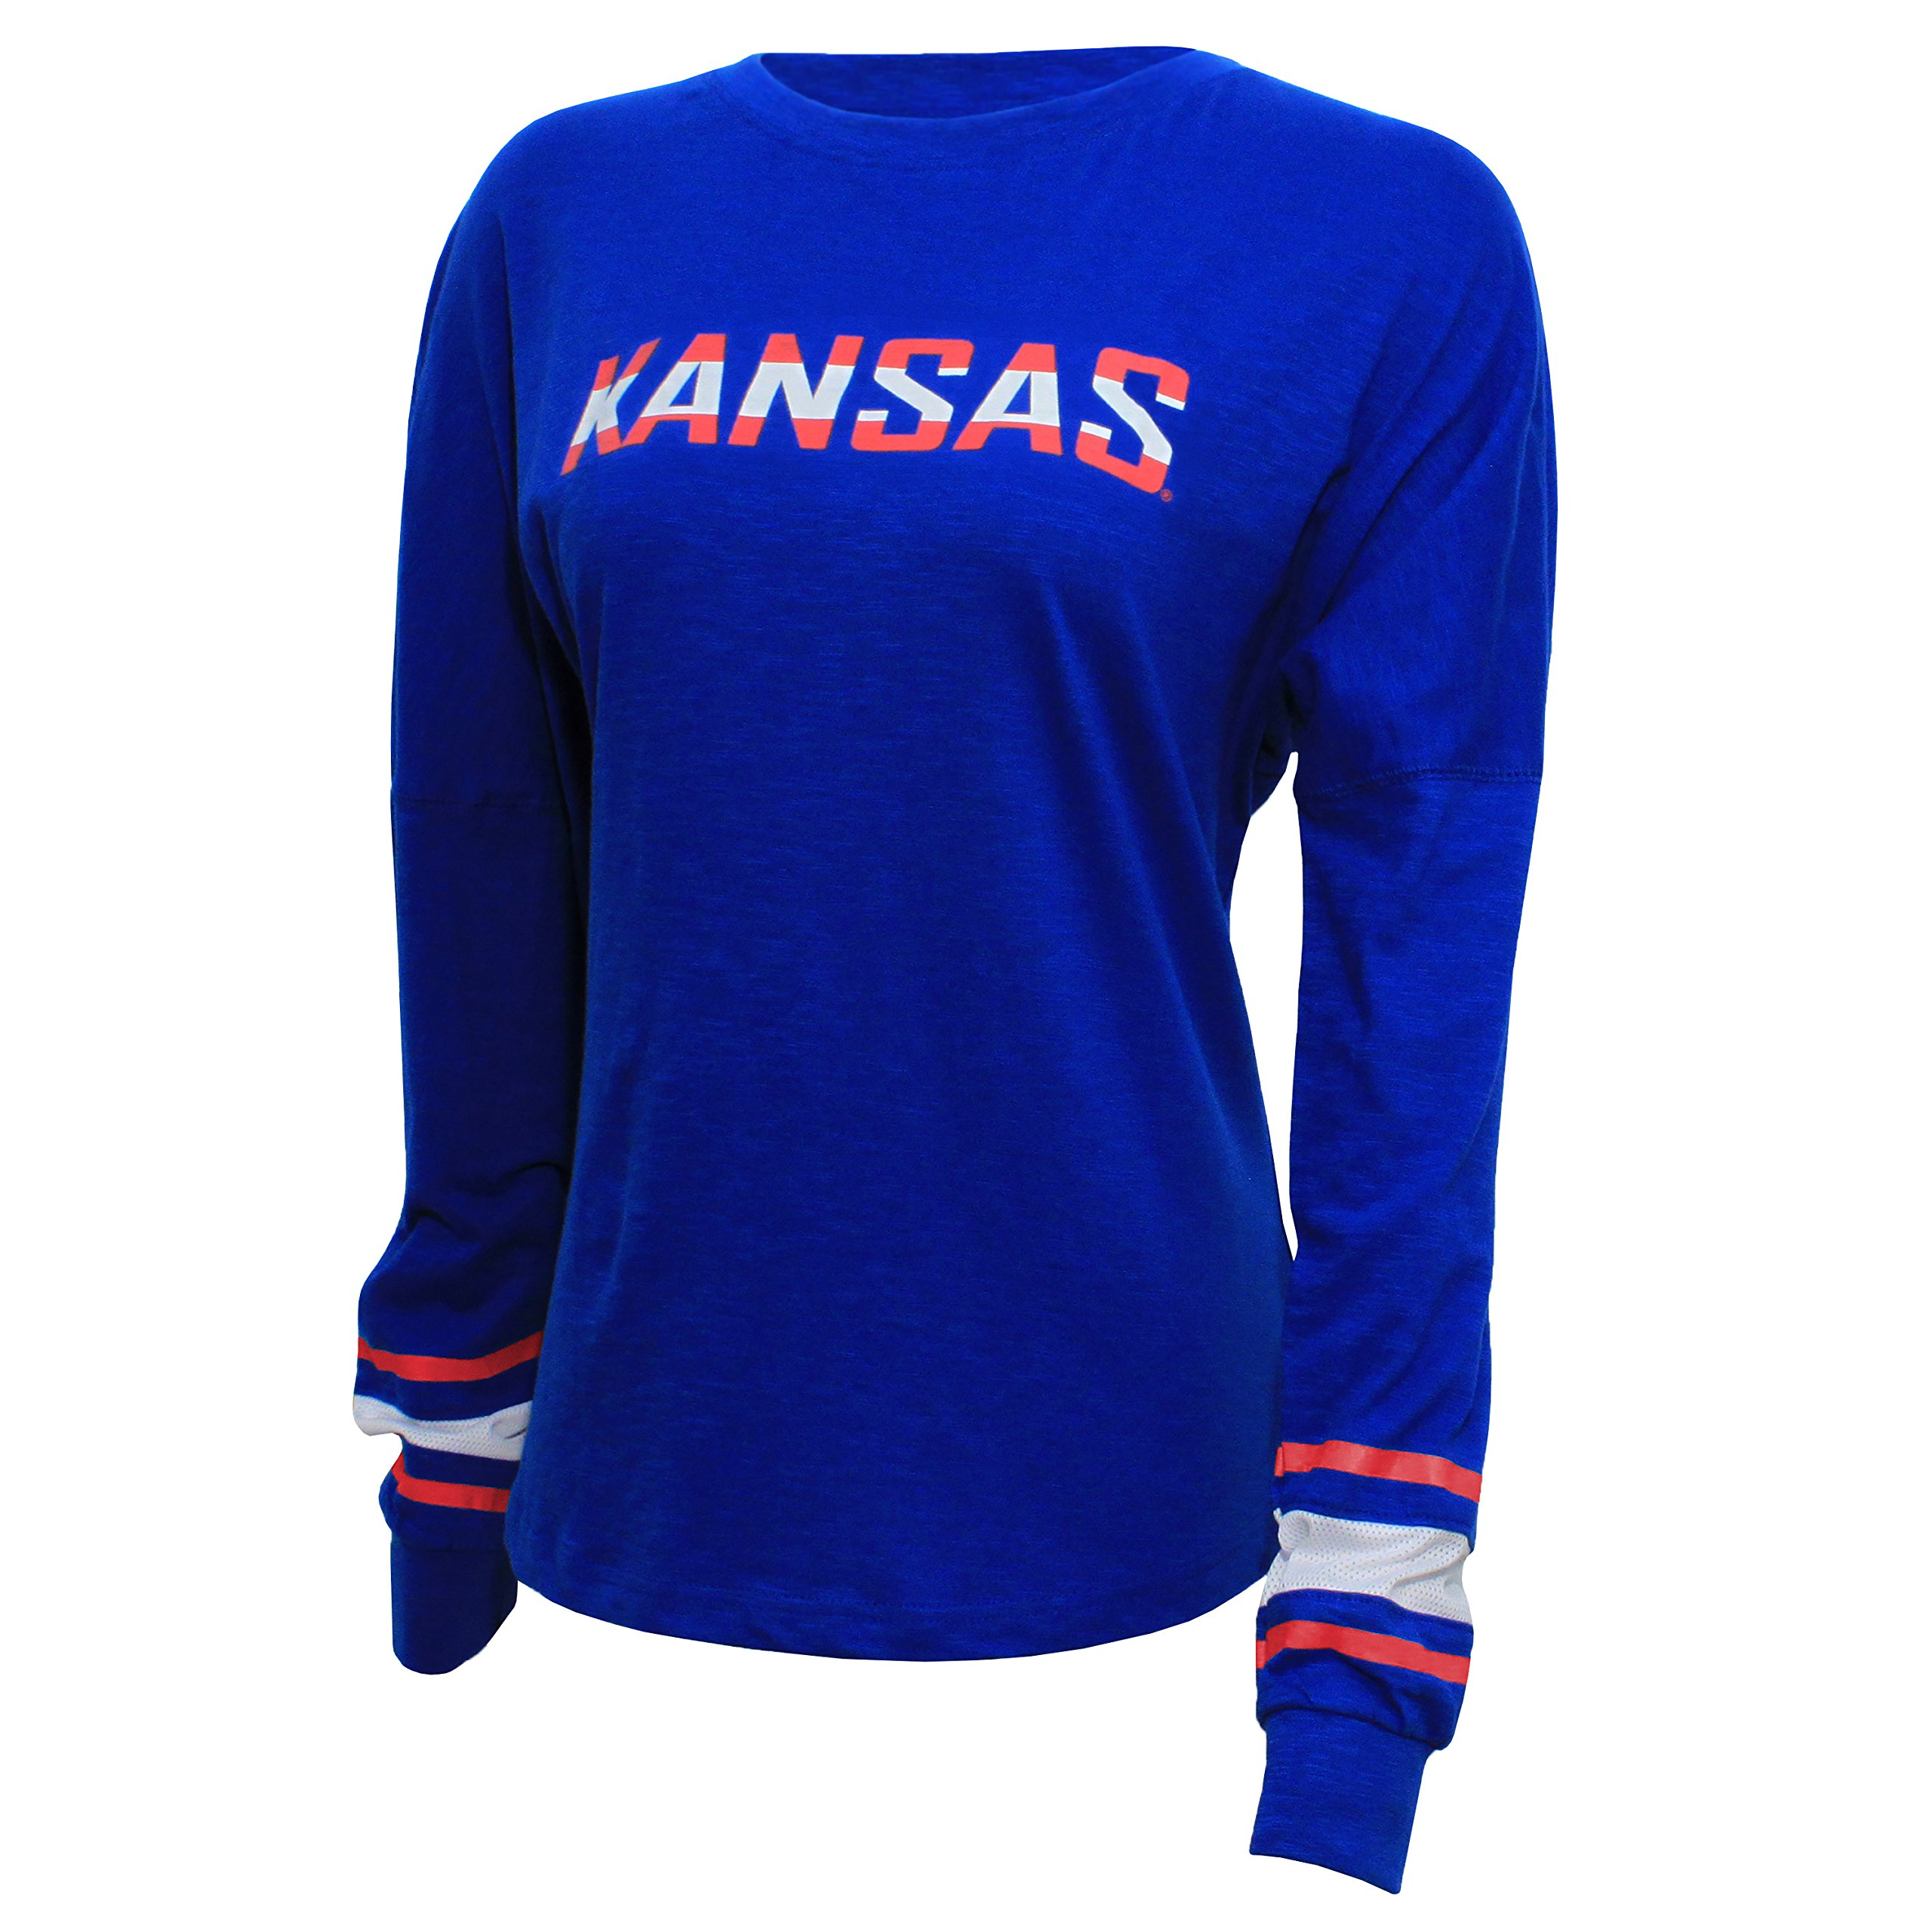 NCAA Kansas Jayhawks Women's Campus Specialties Long Sleeve Fan Tee, Small, Royal